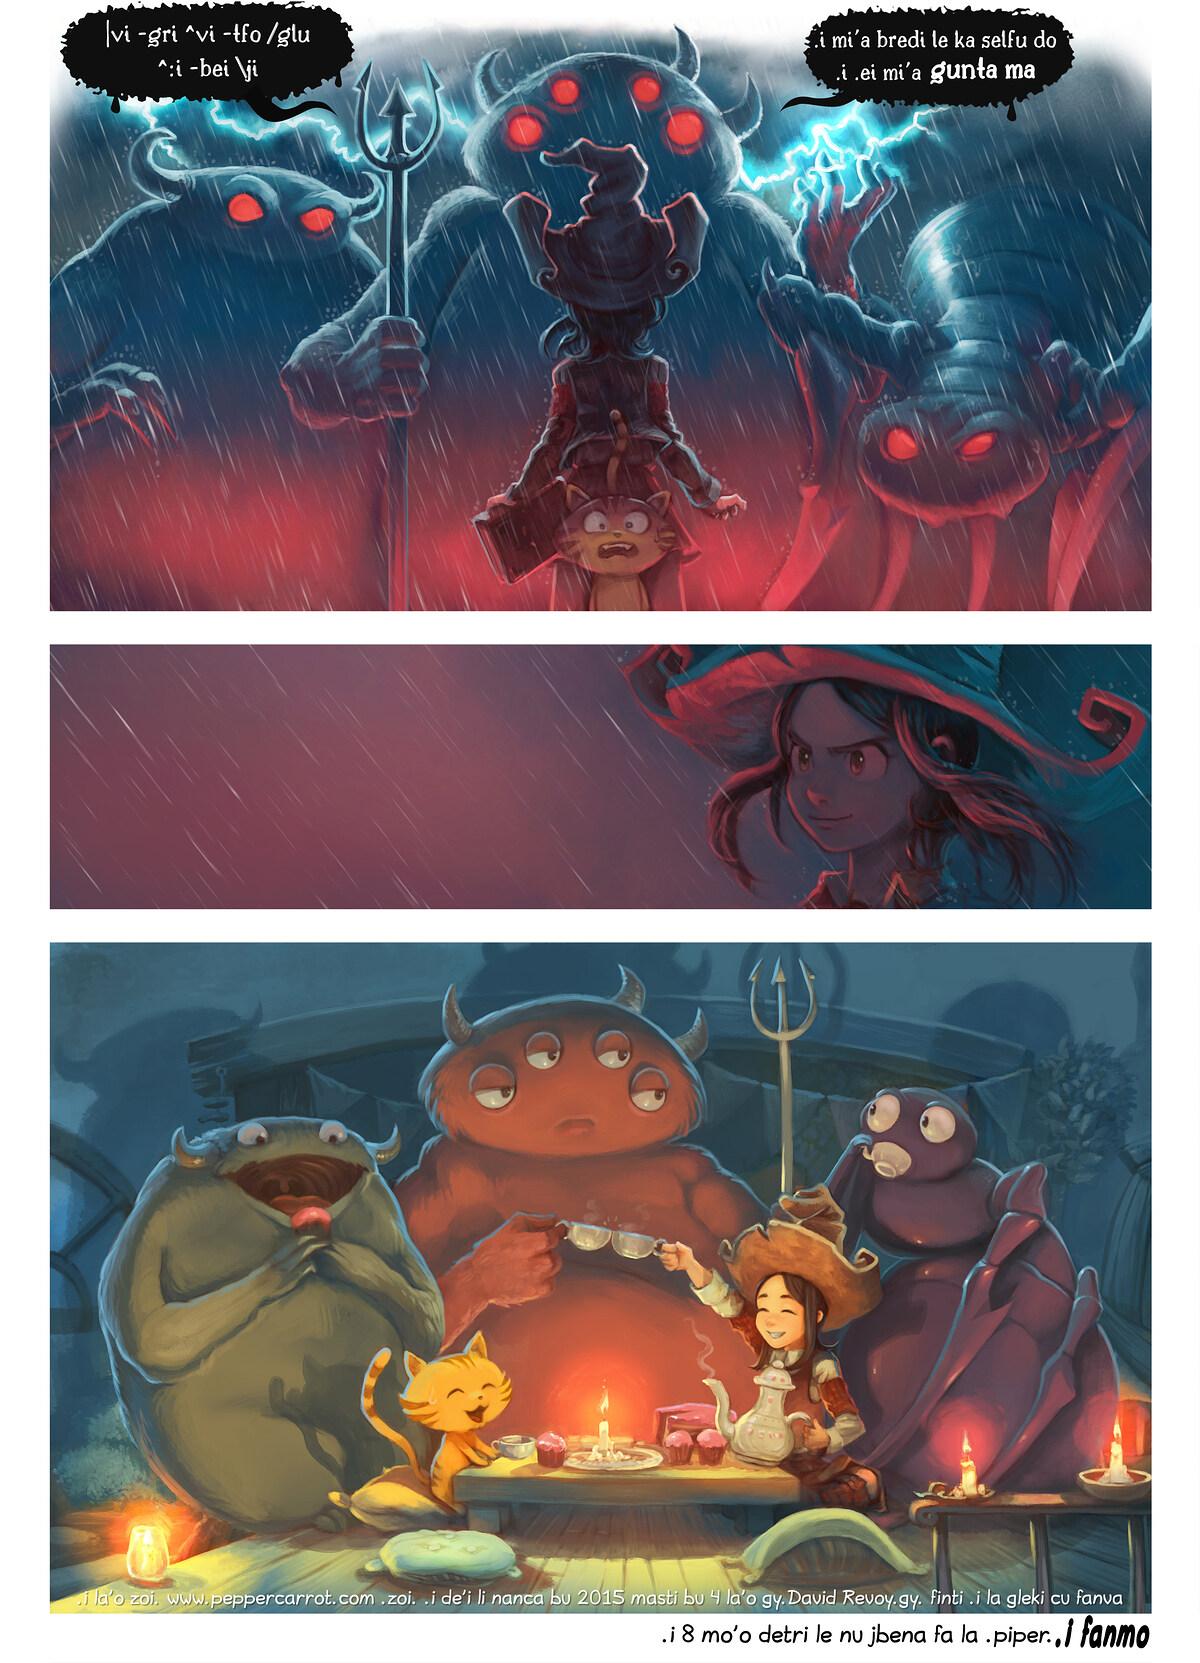 A webcomic page of Pepper&Carrot, pagbu 8 [jb], papri 6